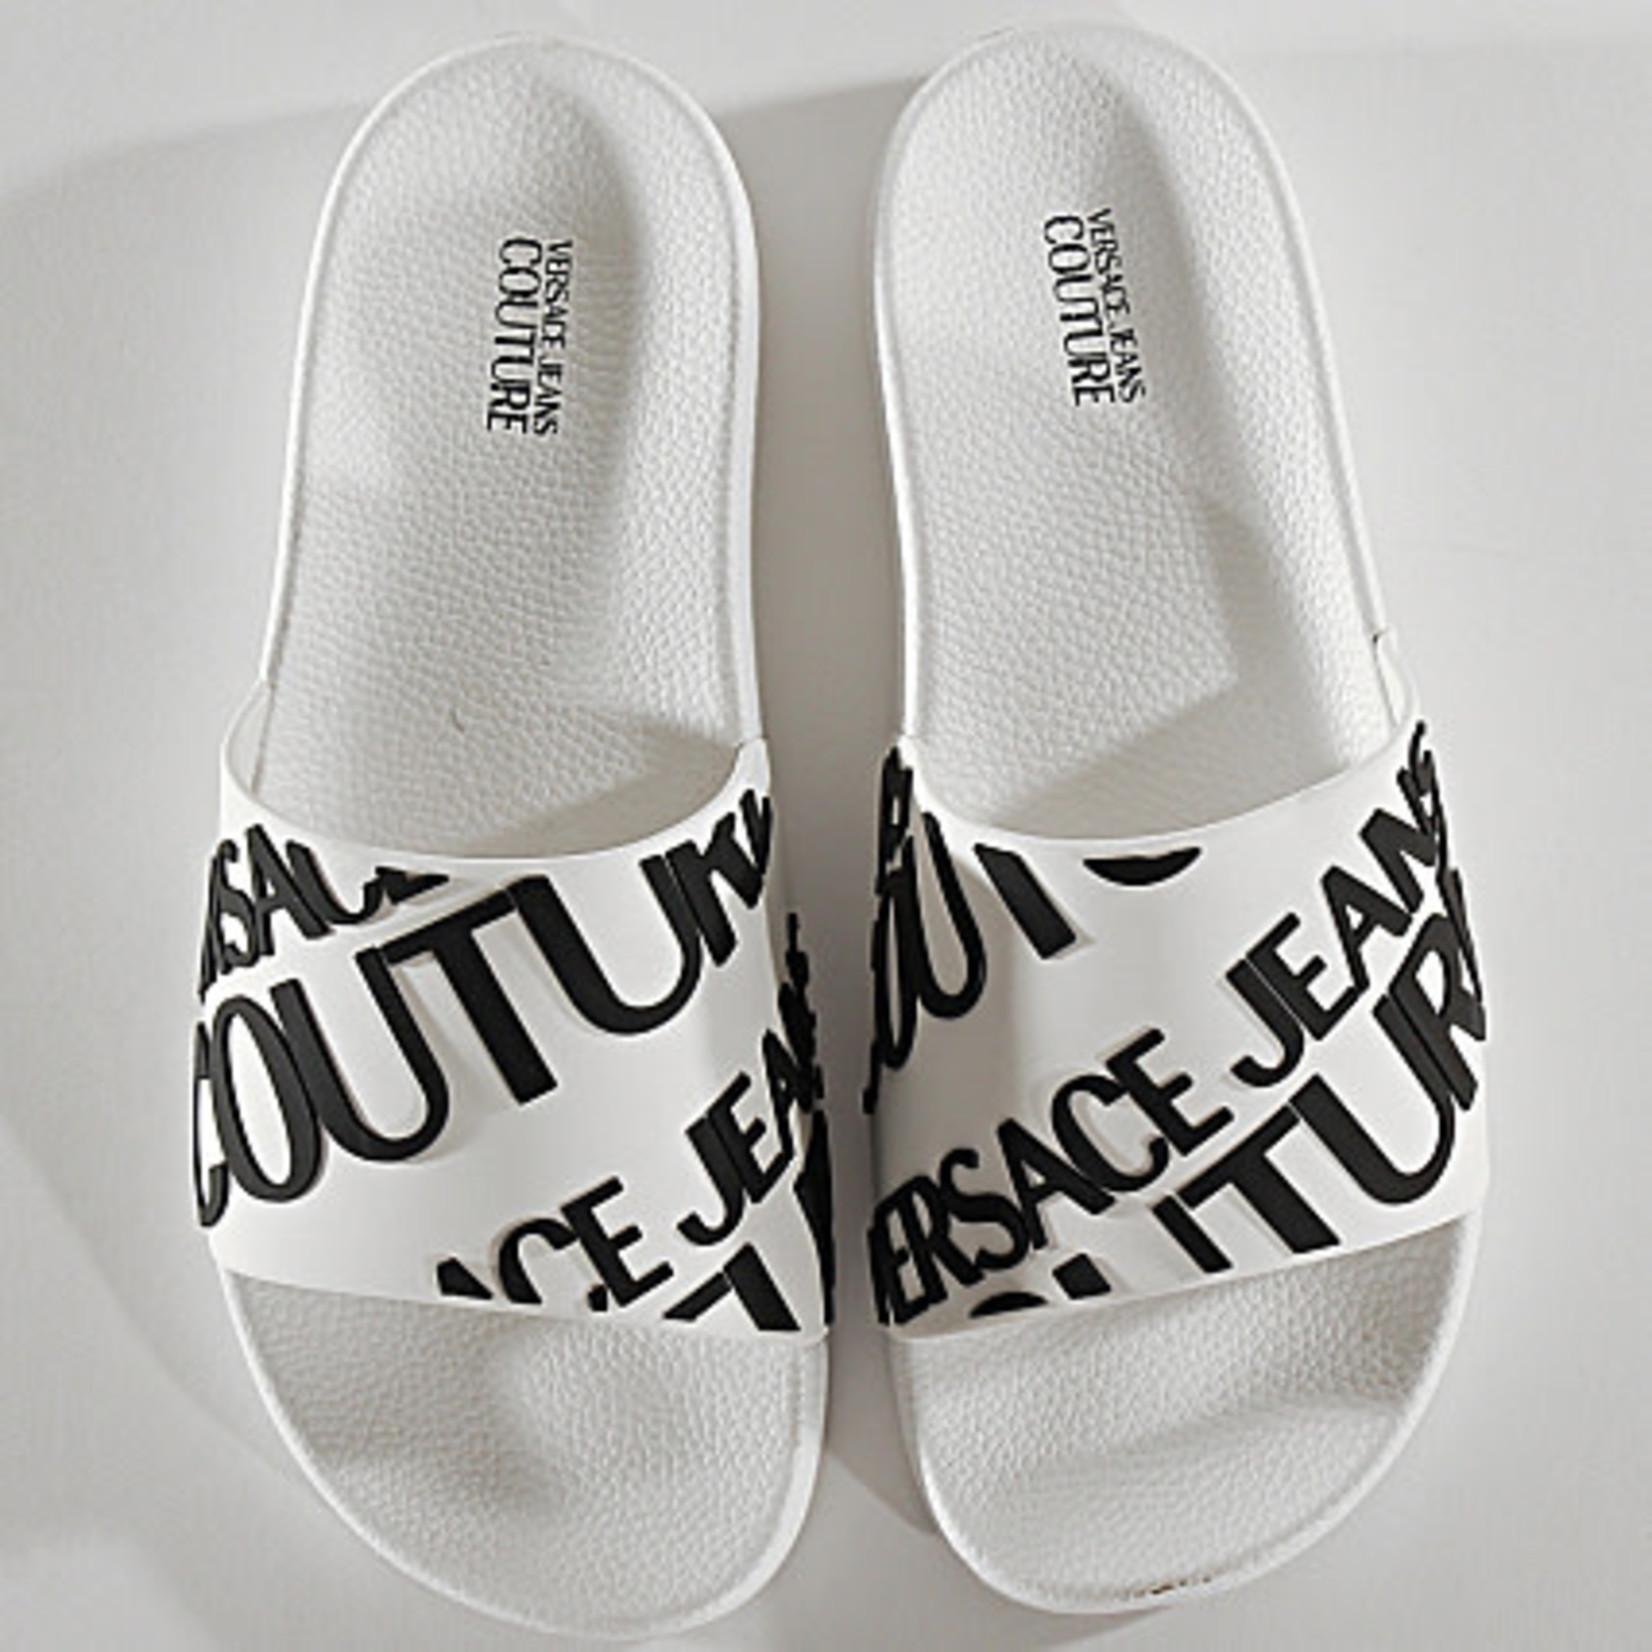 VERSACE JEANS COUTURE Versace Jeans Couture - Men's Sandals - Slide Dis61